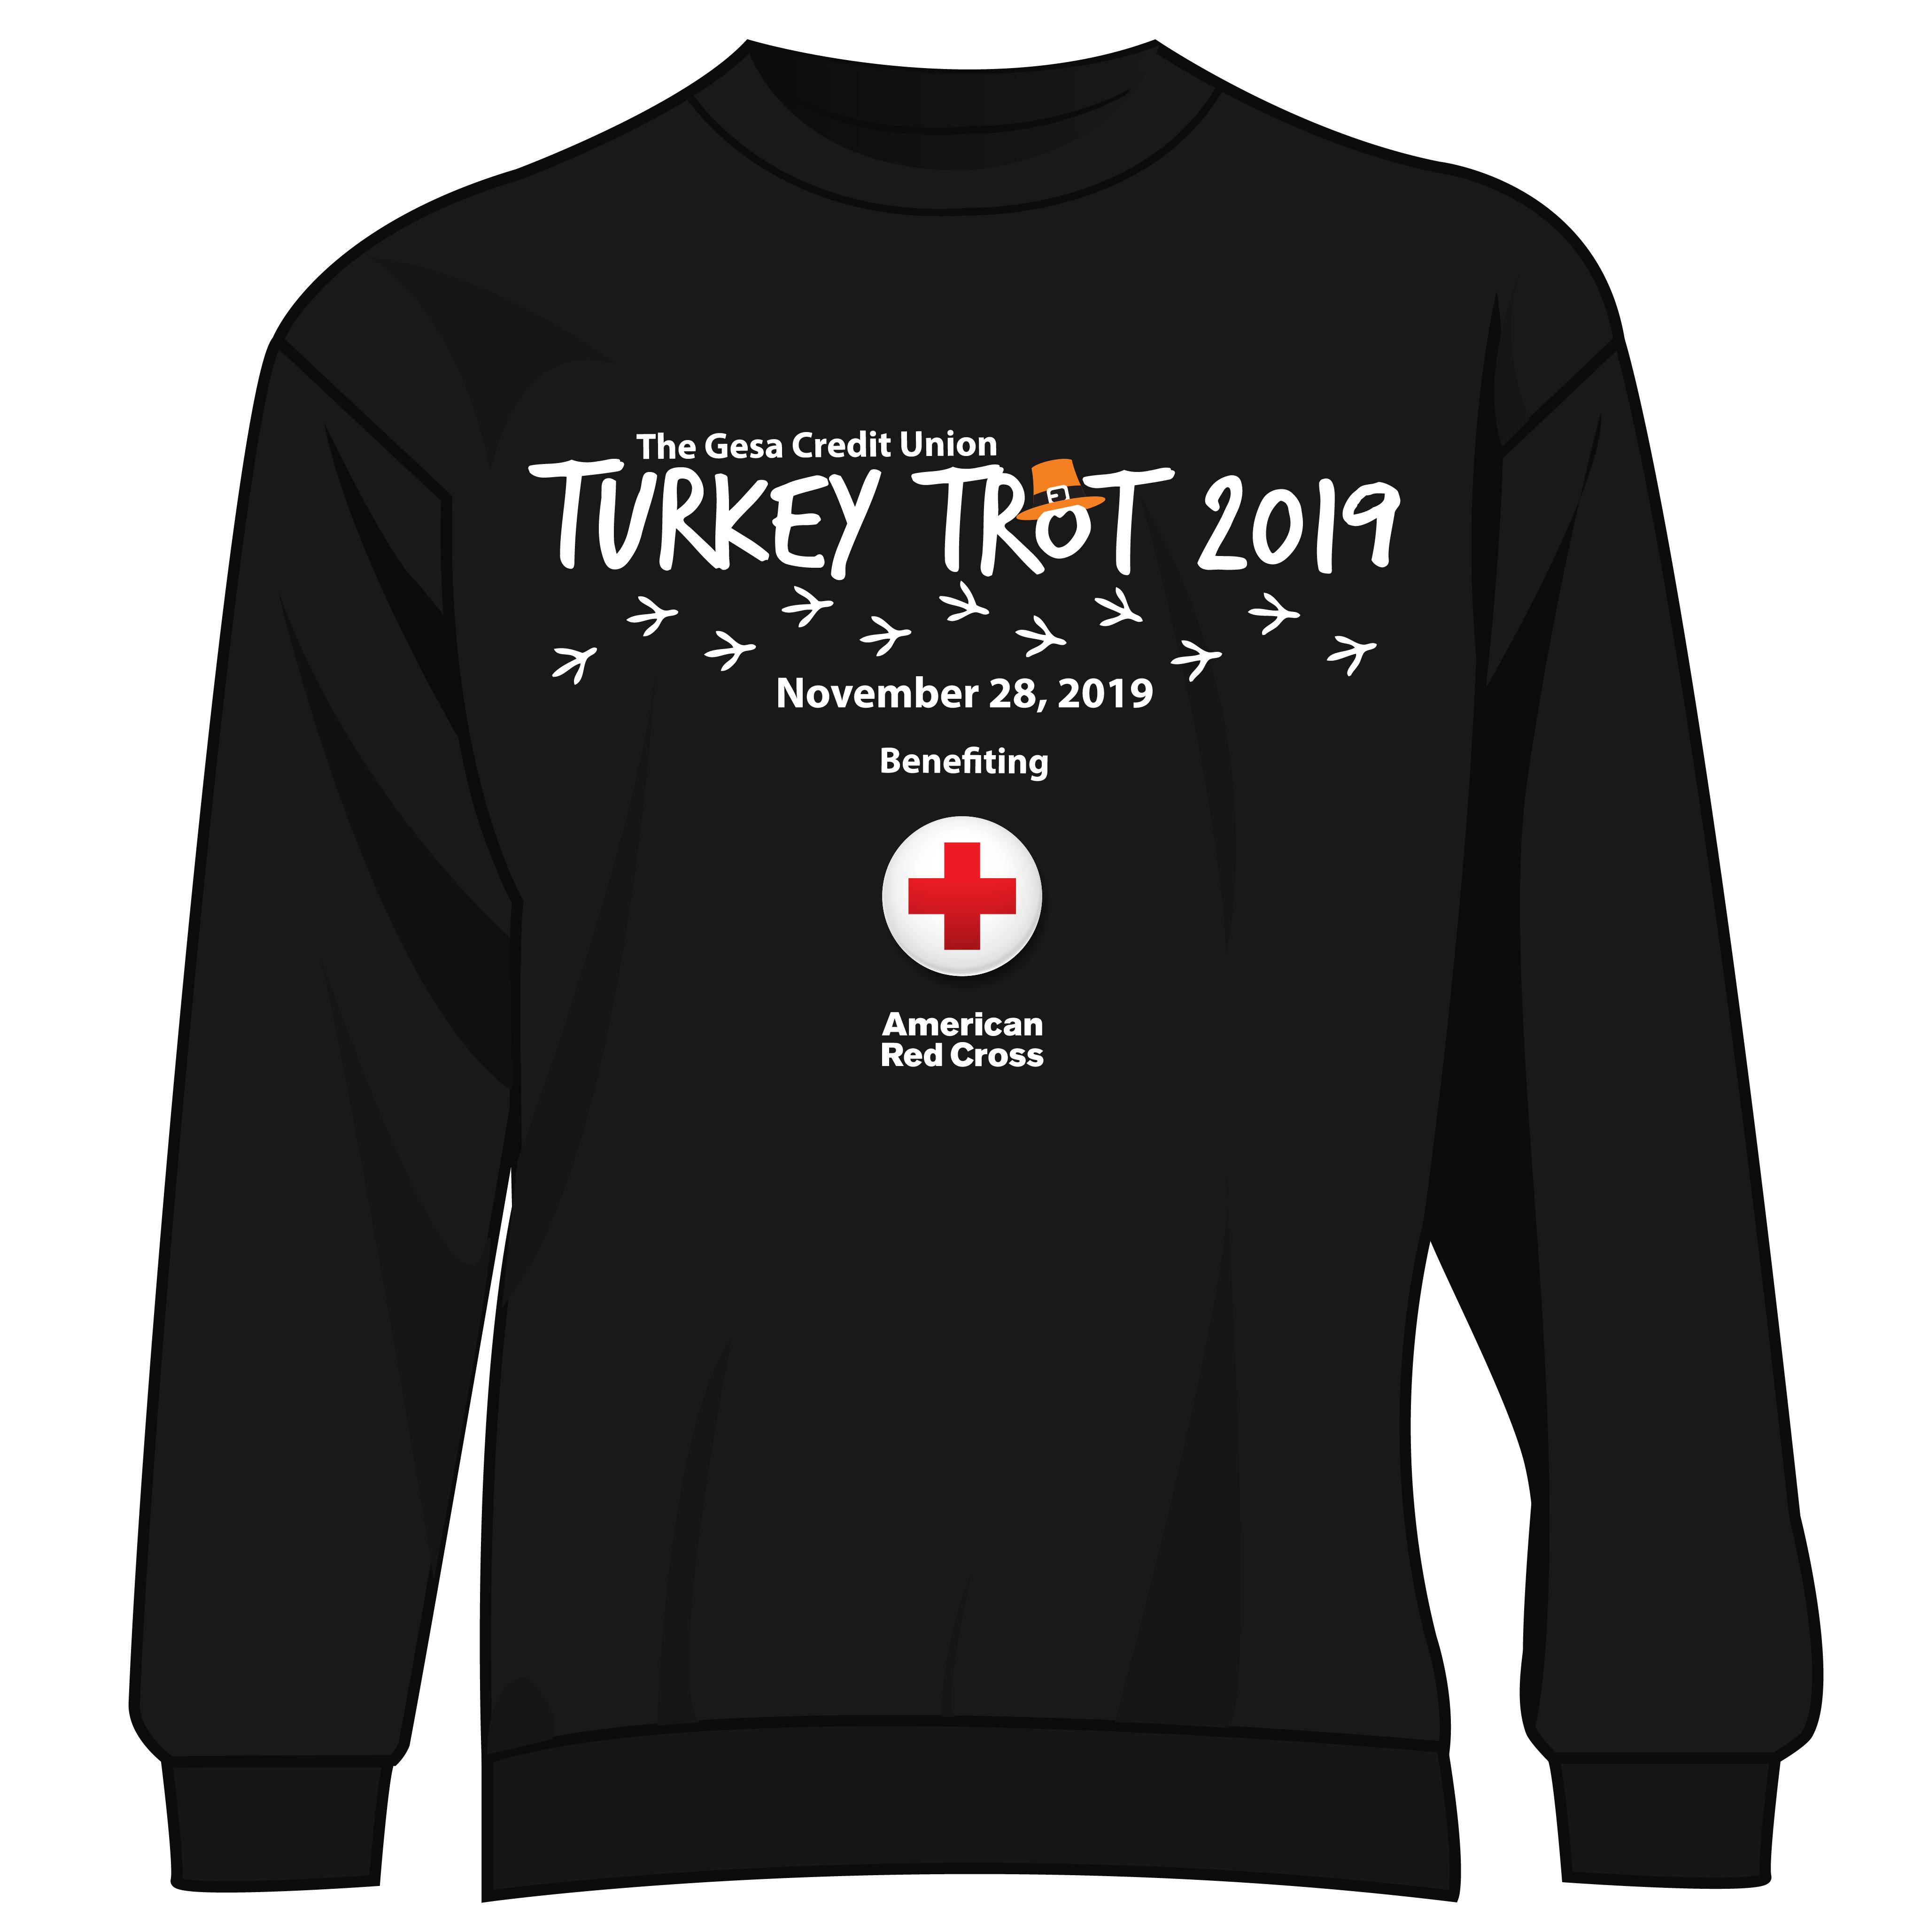 2019 Turkey Trot Shirt